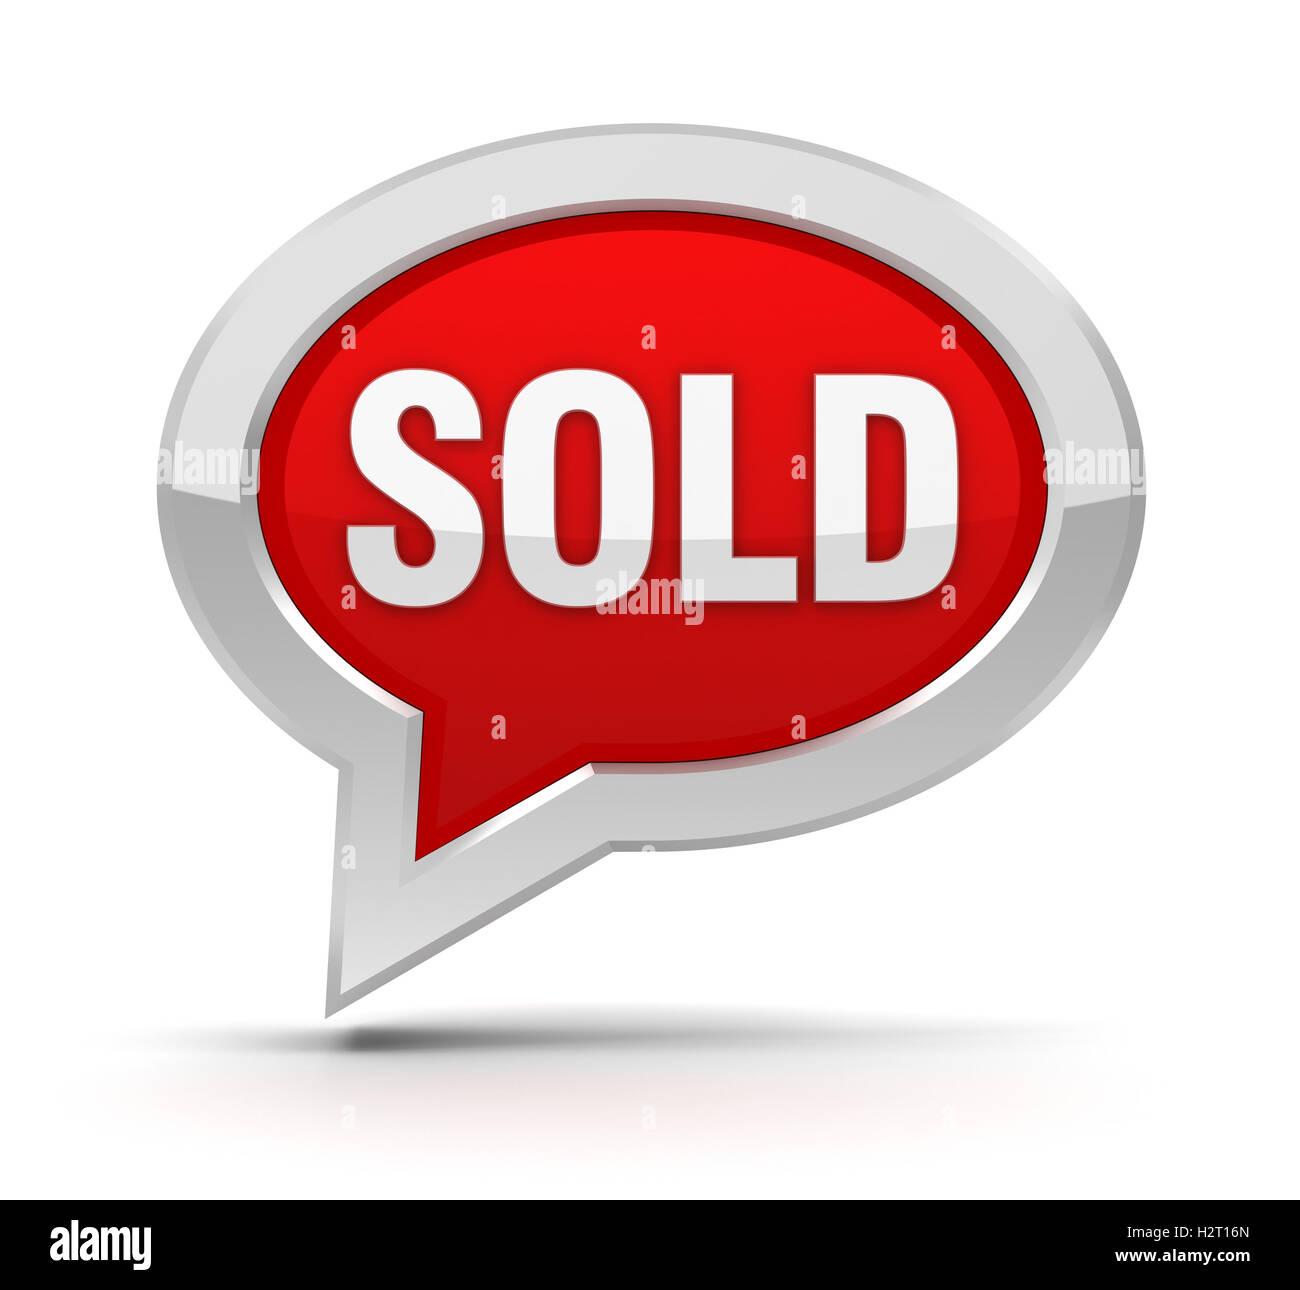 sold concept 3d illustration - Stock Image